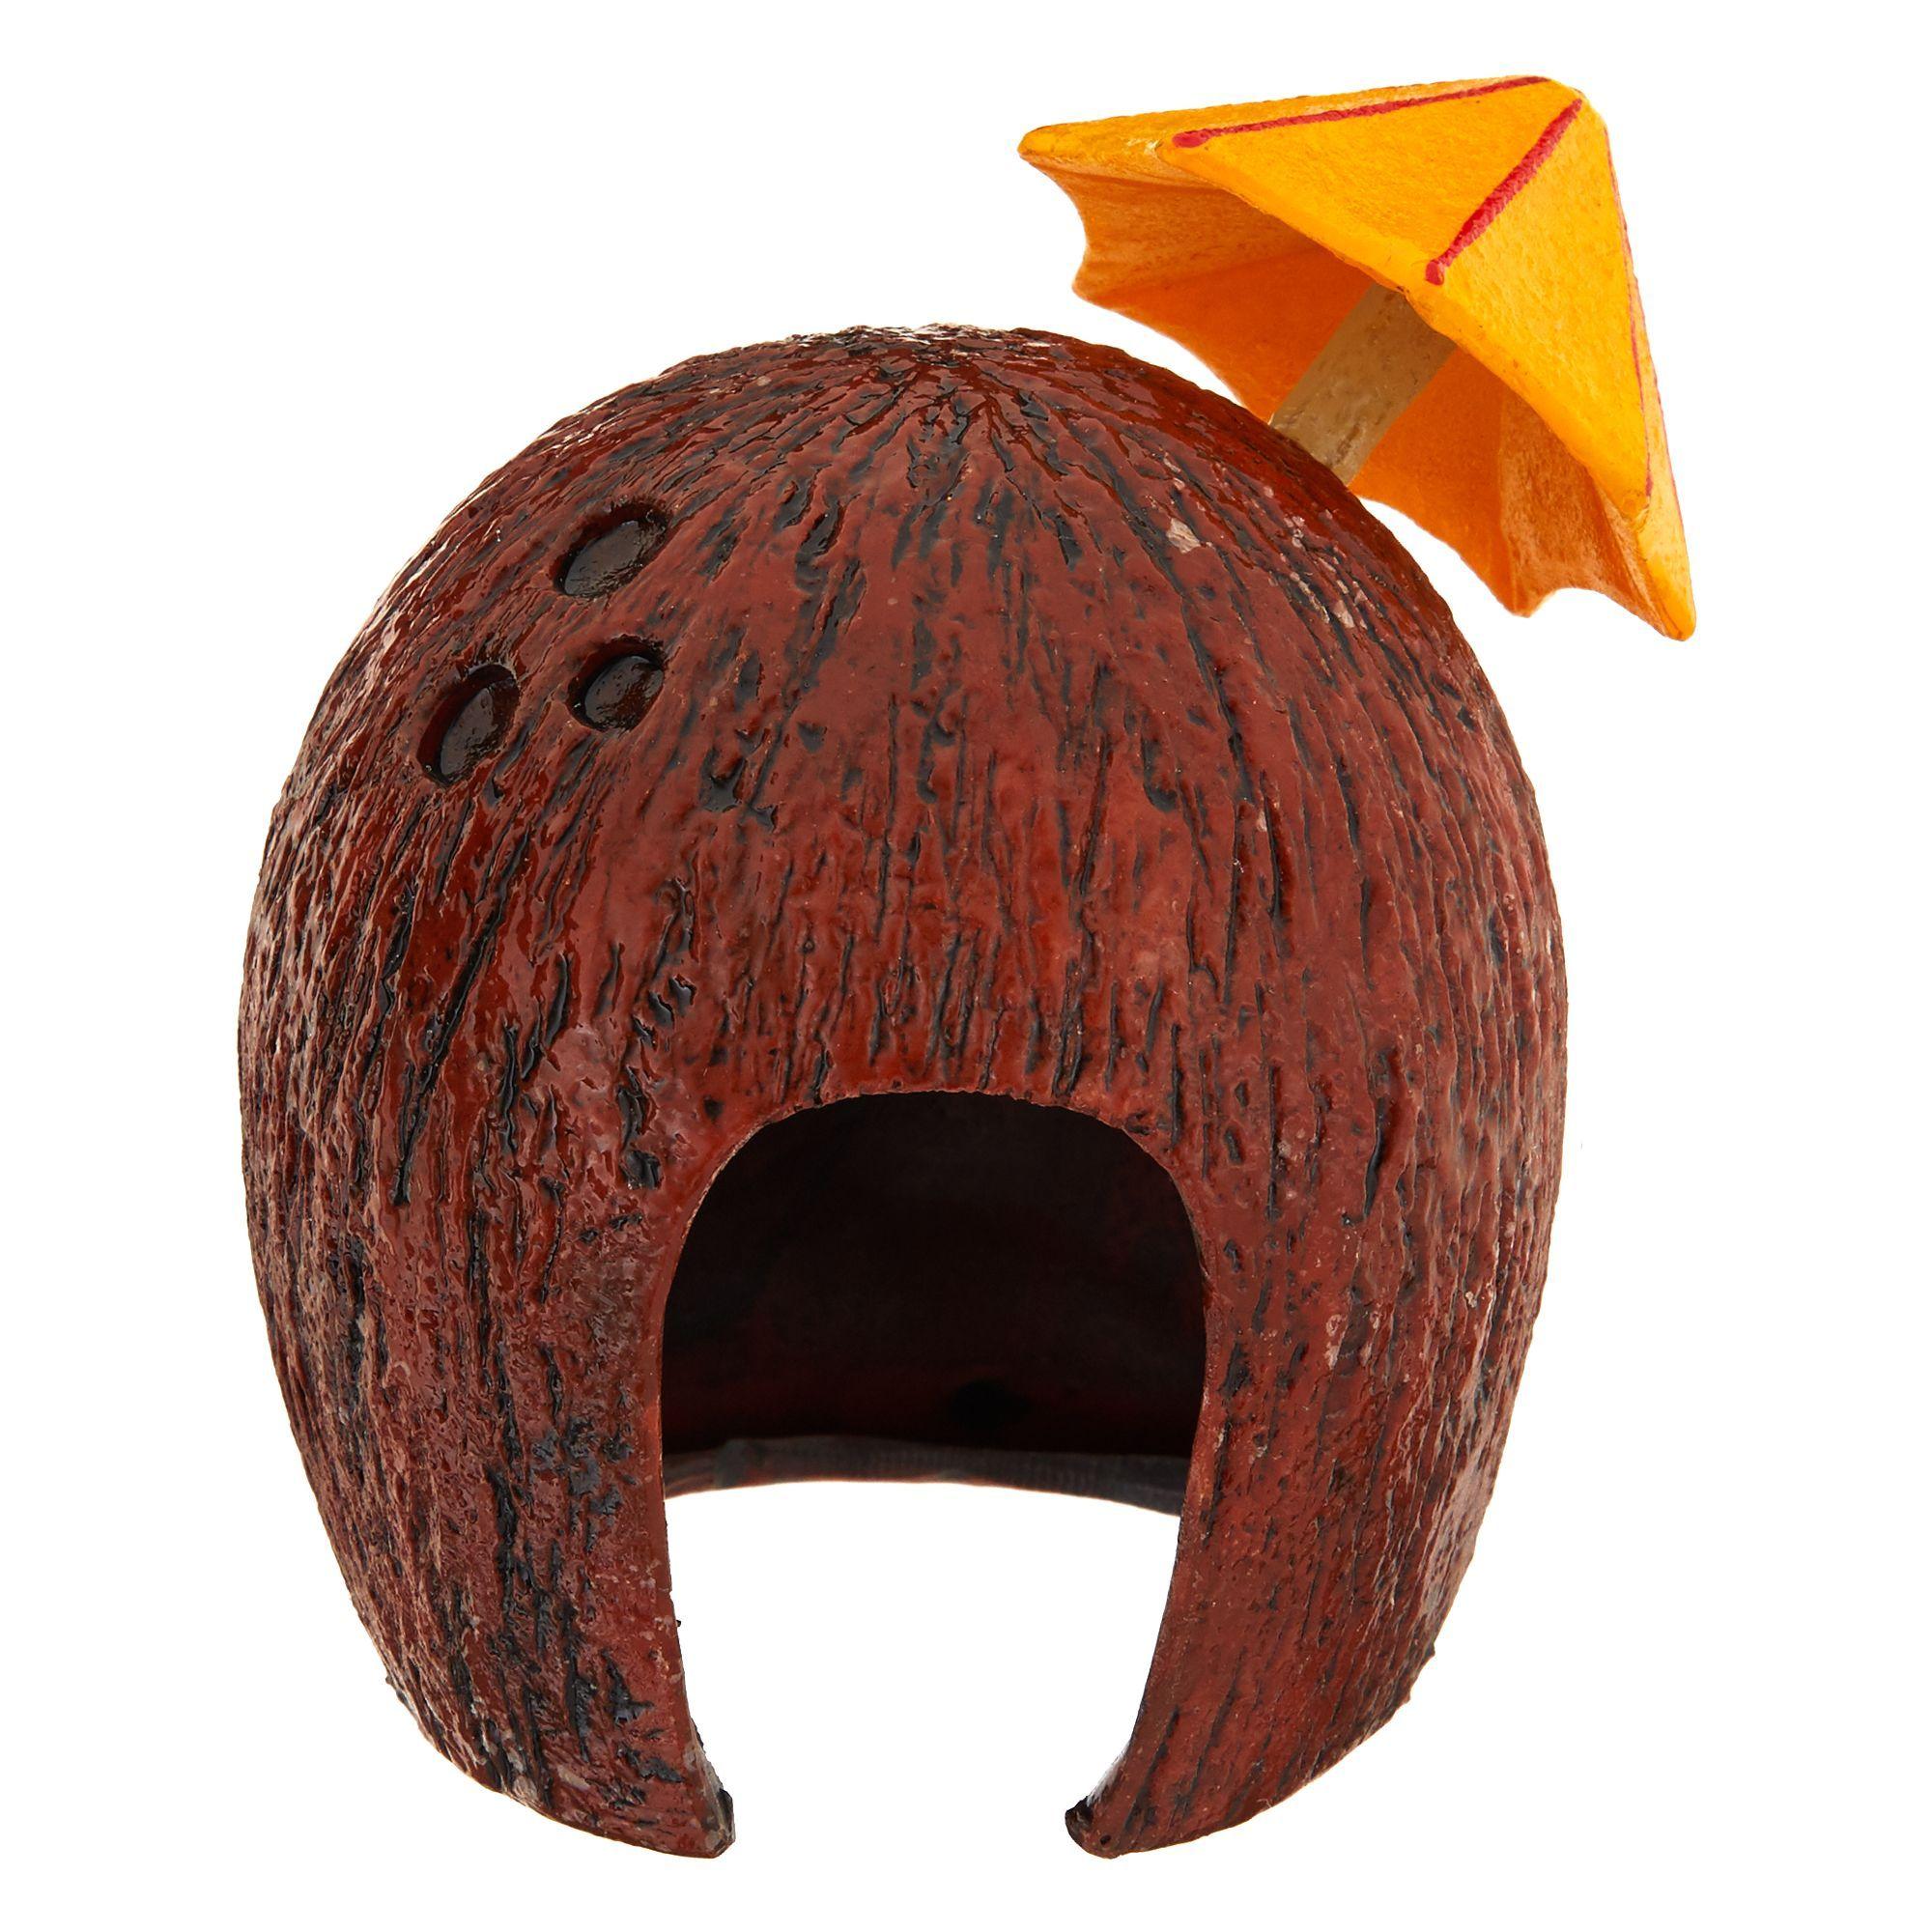 Top Fin Coconut Cavern Aquarium Ornament, Brown in 2020